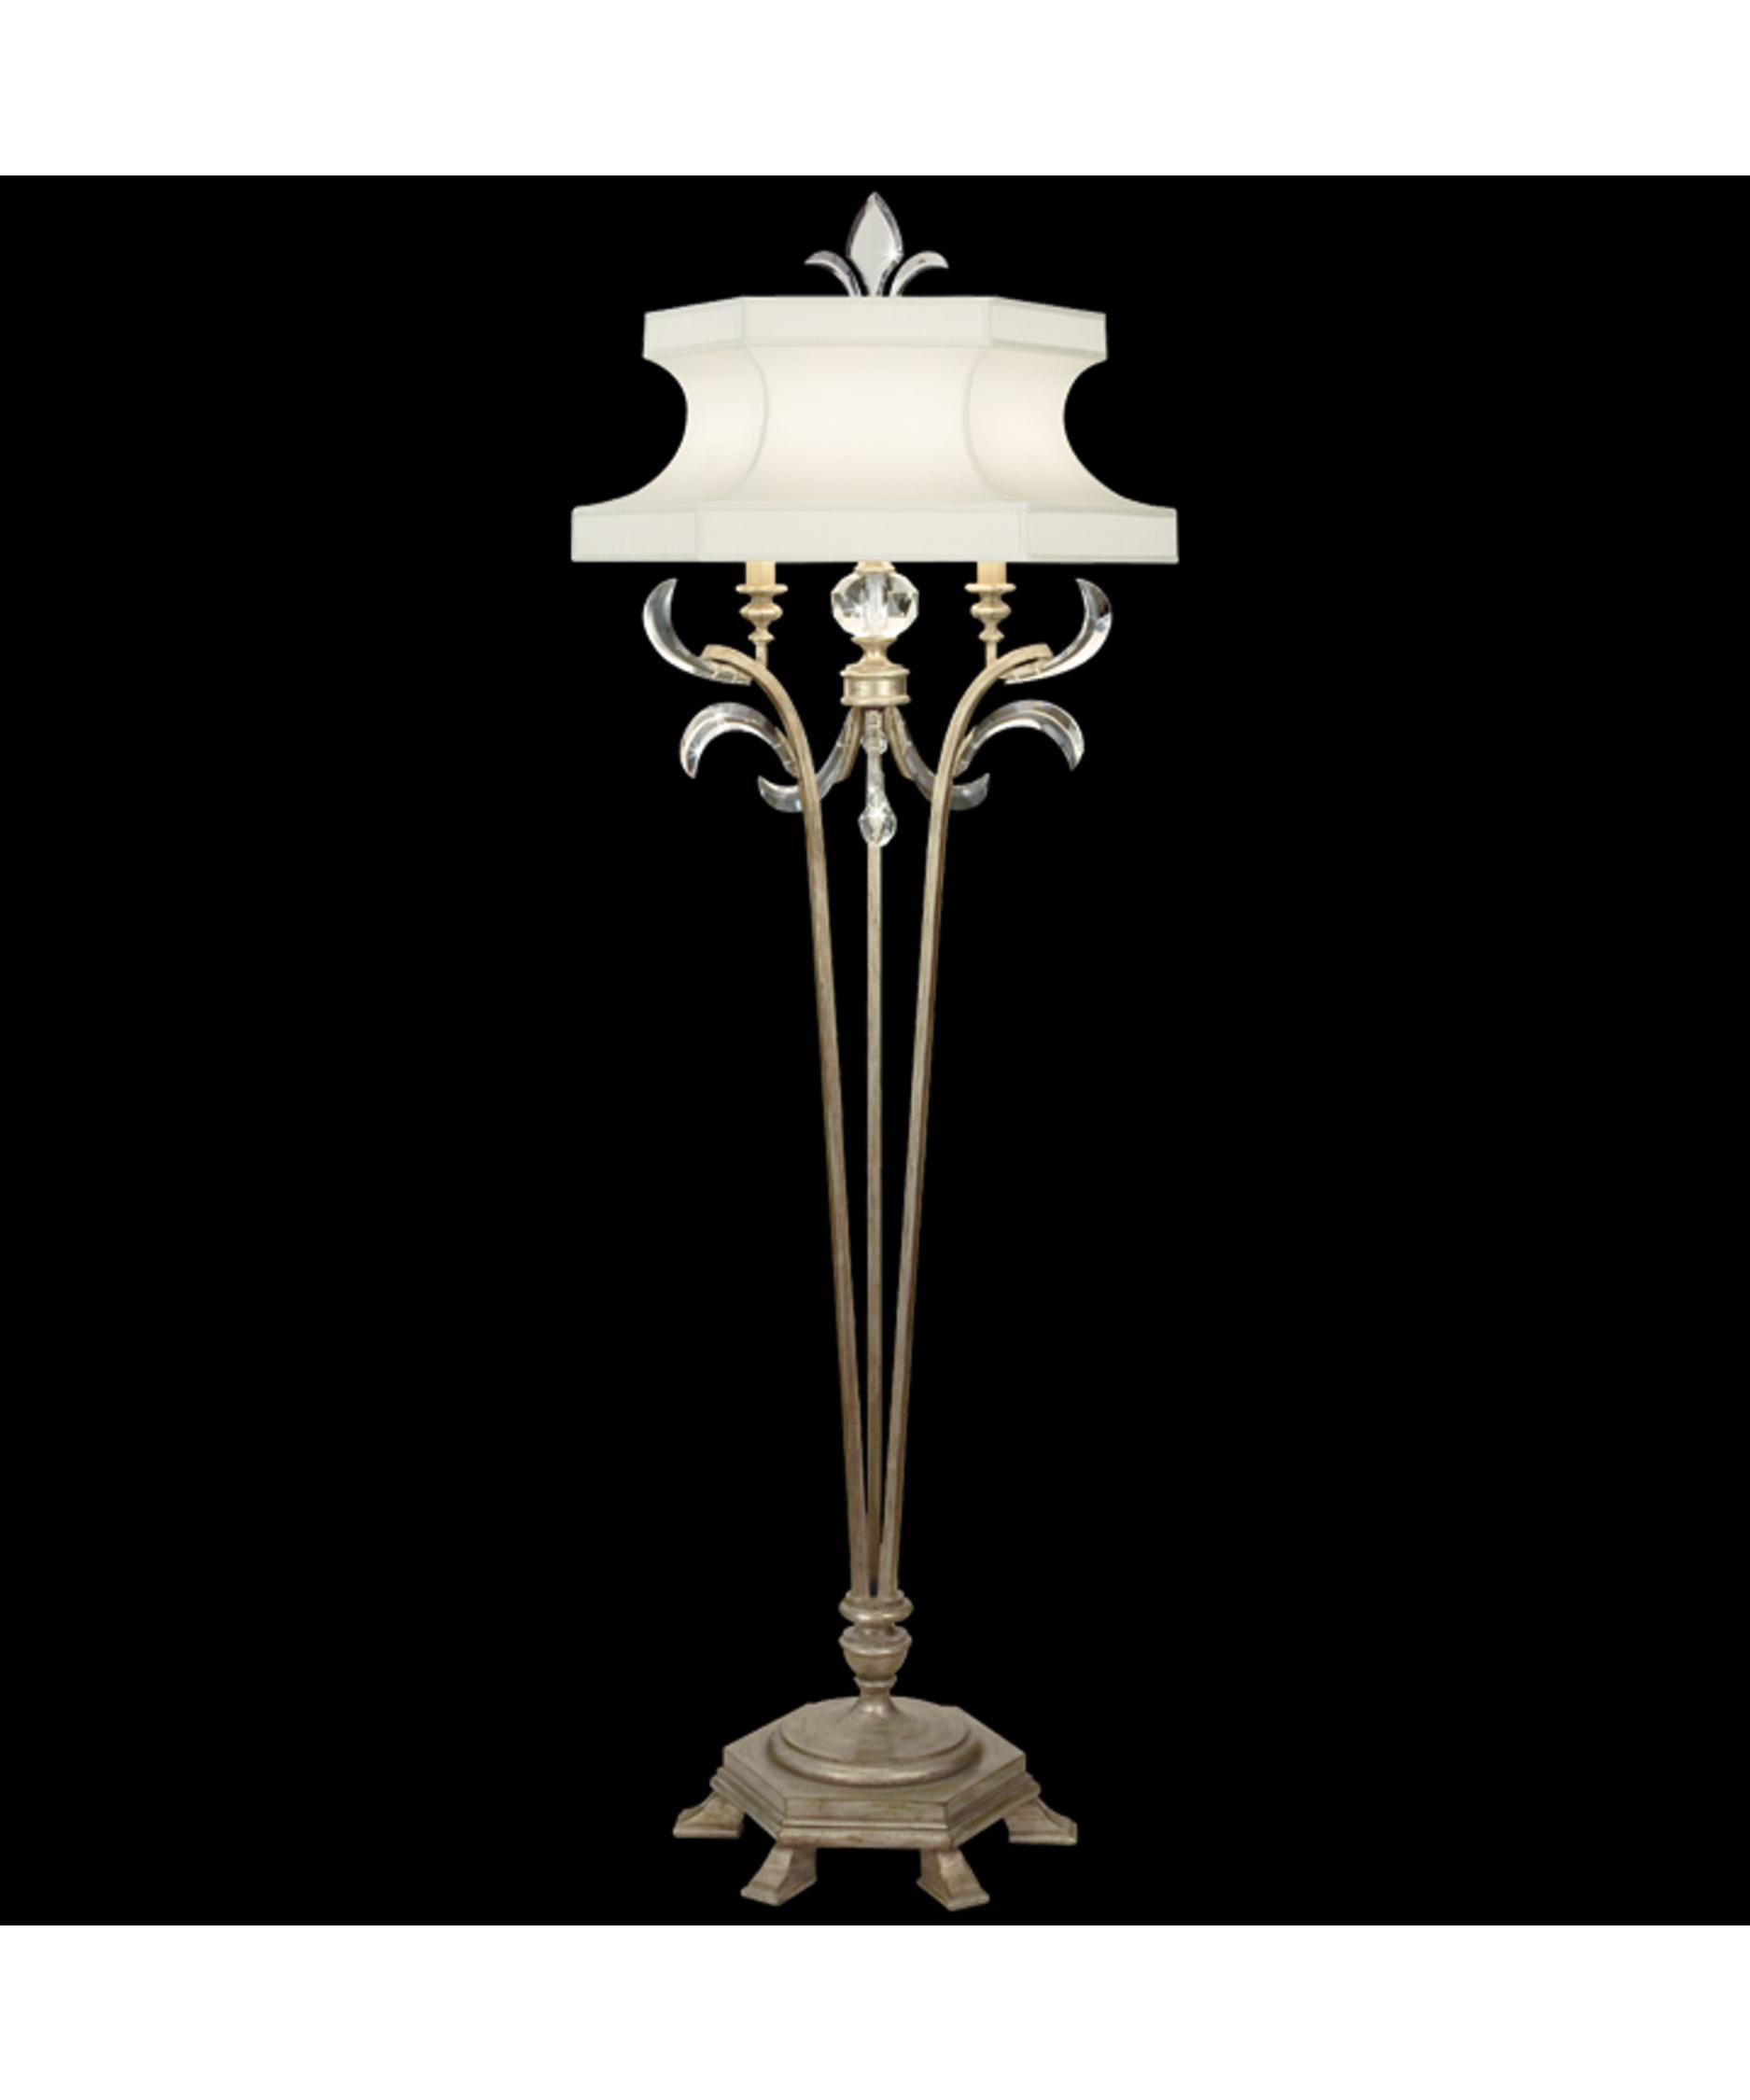 Fine Art Lamps Beveled Arcs 72 Inch High Floor Lamp – Chandelier Floor Lamp Closeout